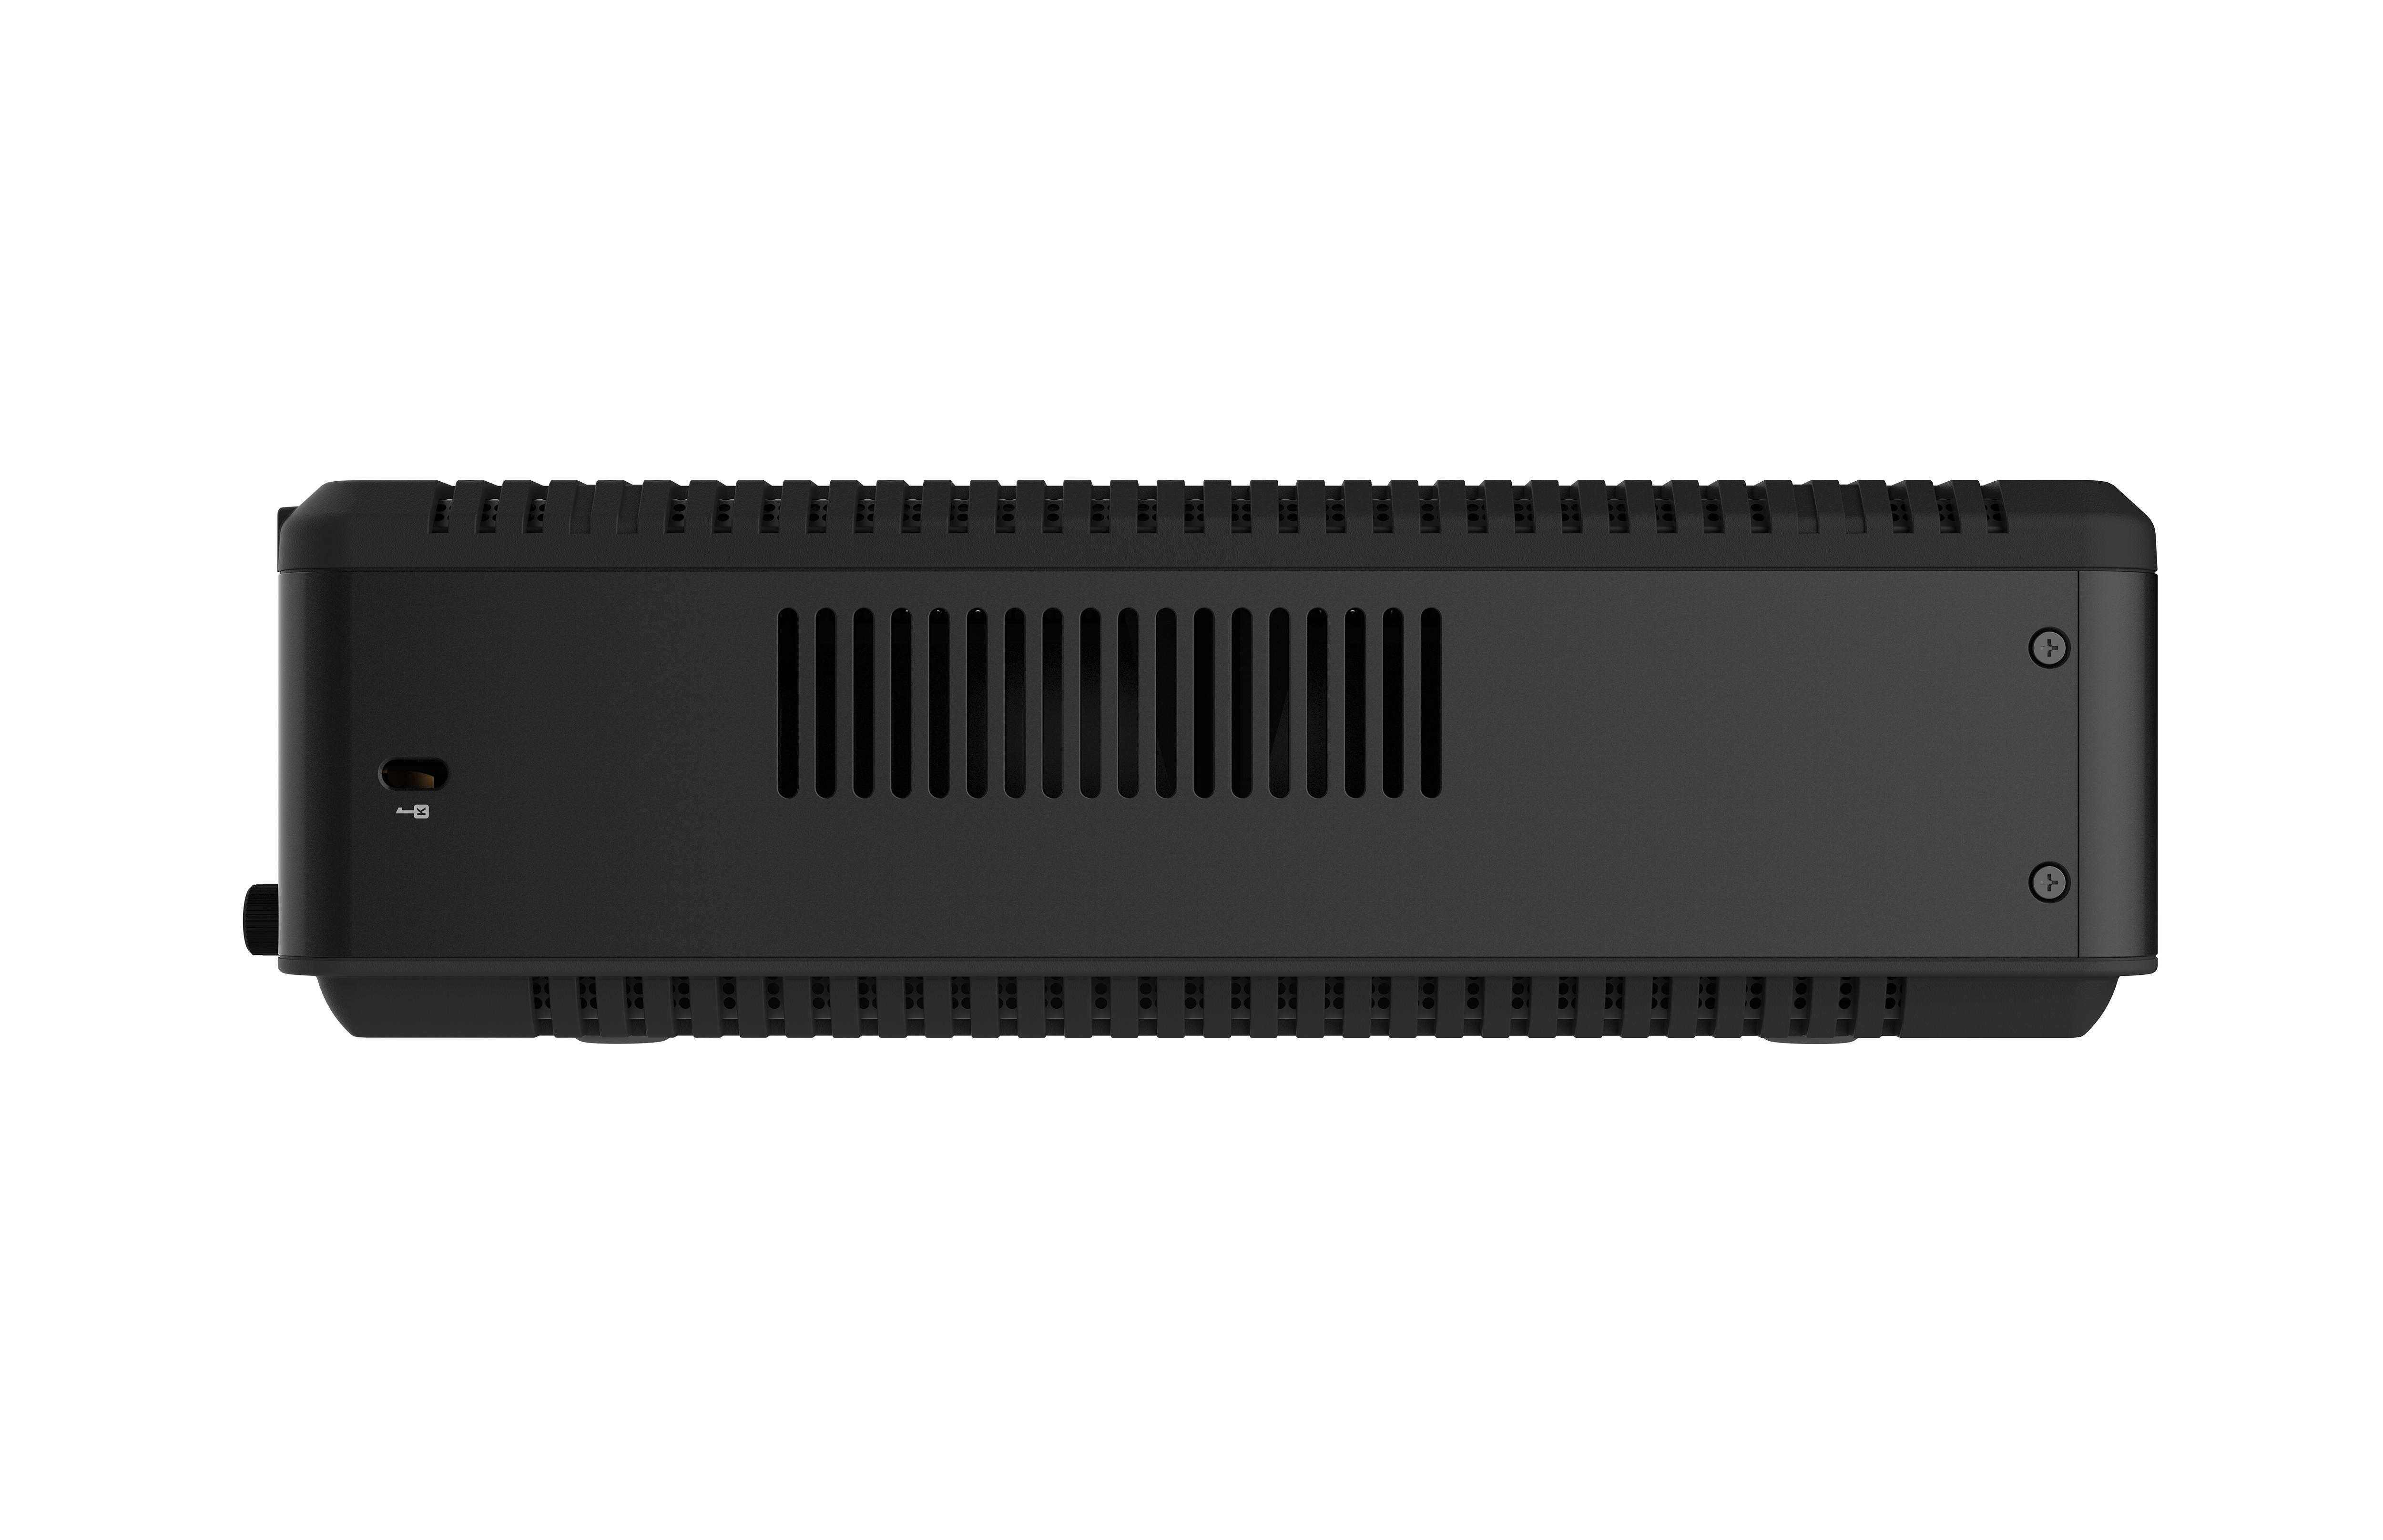 Magnus EN1070/EN1060: Zotac stellt besonders kleine Mini-PCs für VR-Gaming vor - Magnus EN1070/EN1060 (Bild: Zotac)